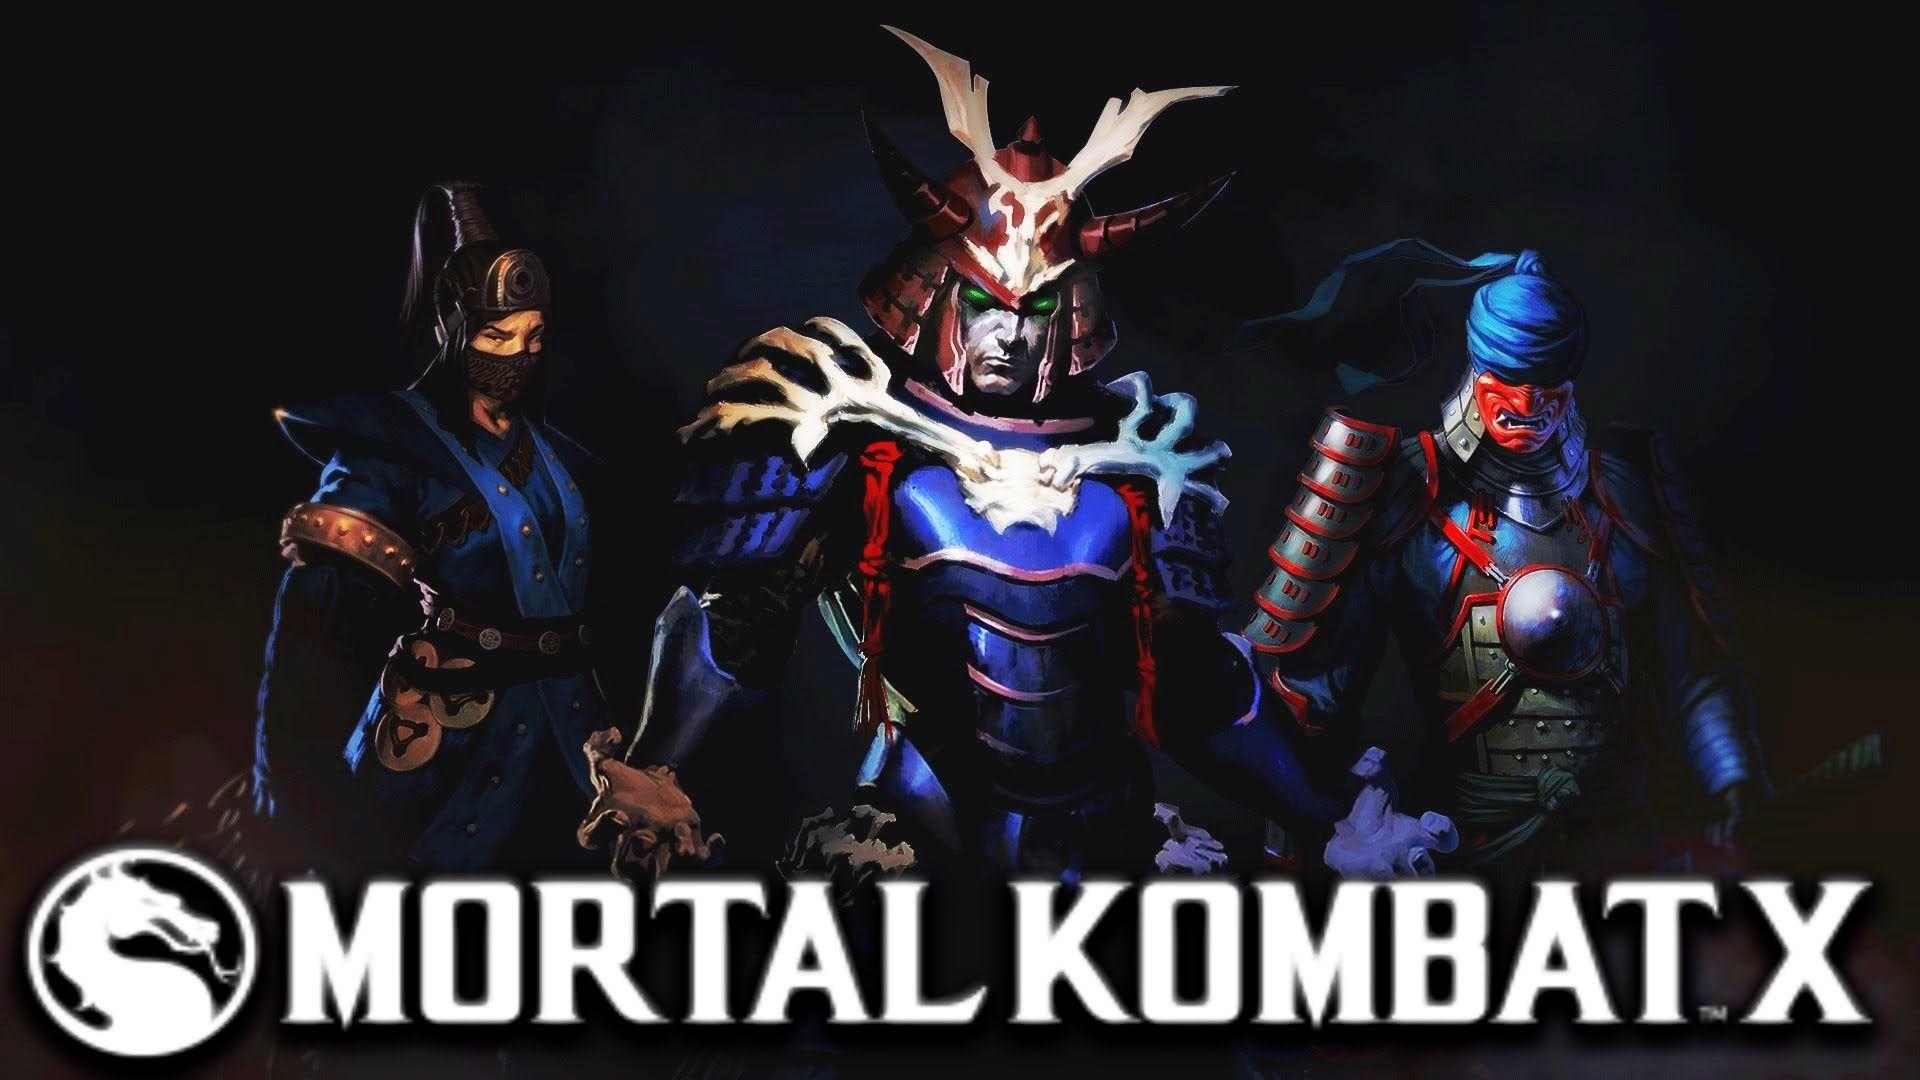 Mortal Kombat X Samurai Skin Pack Ronin Kenshi Samurai Shinnok